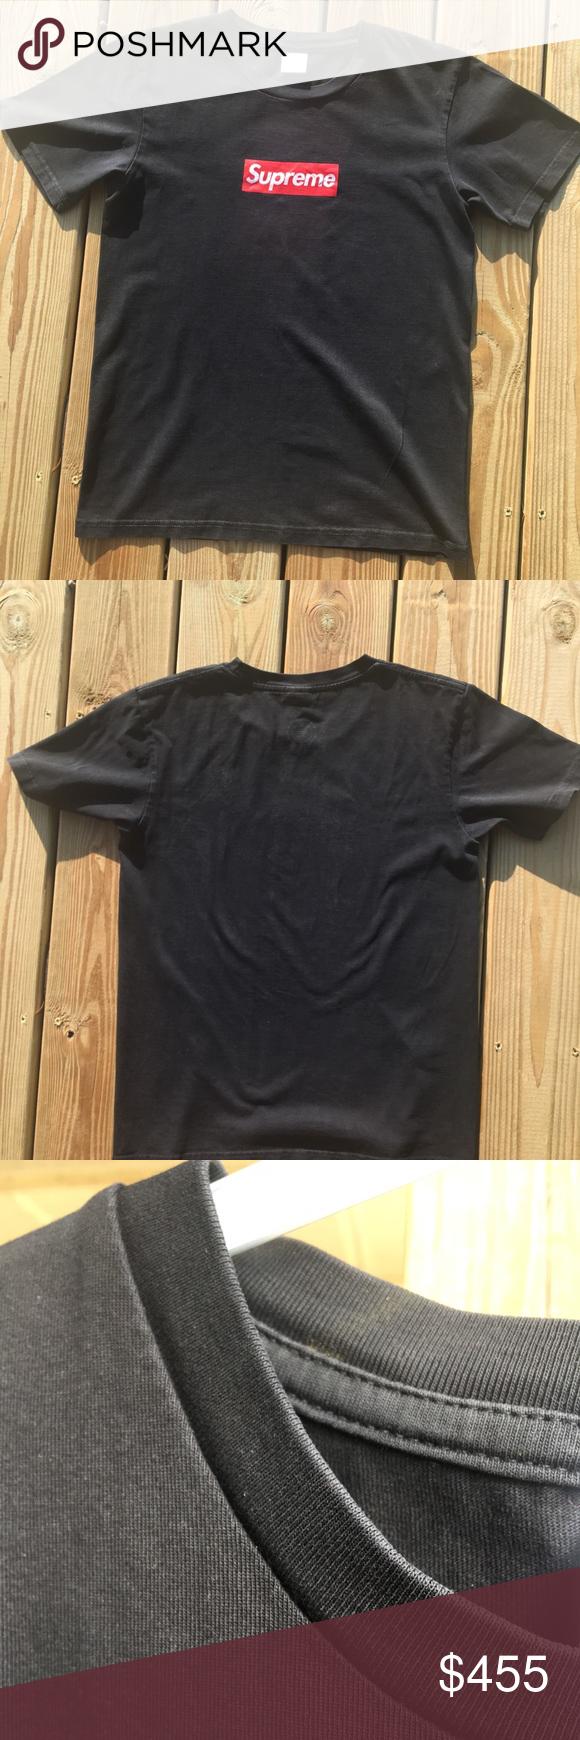 Supreme box logo t shirt Great condition. Men's size S